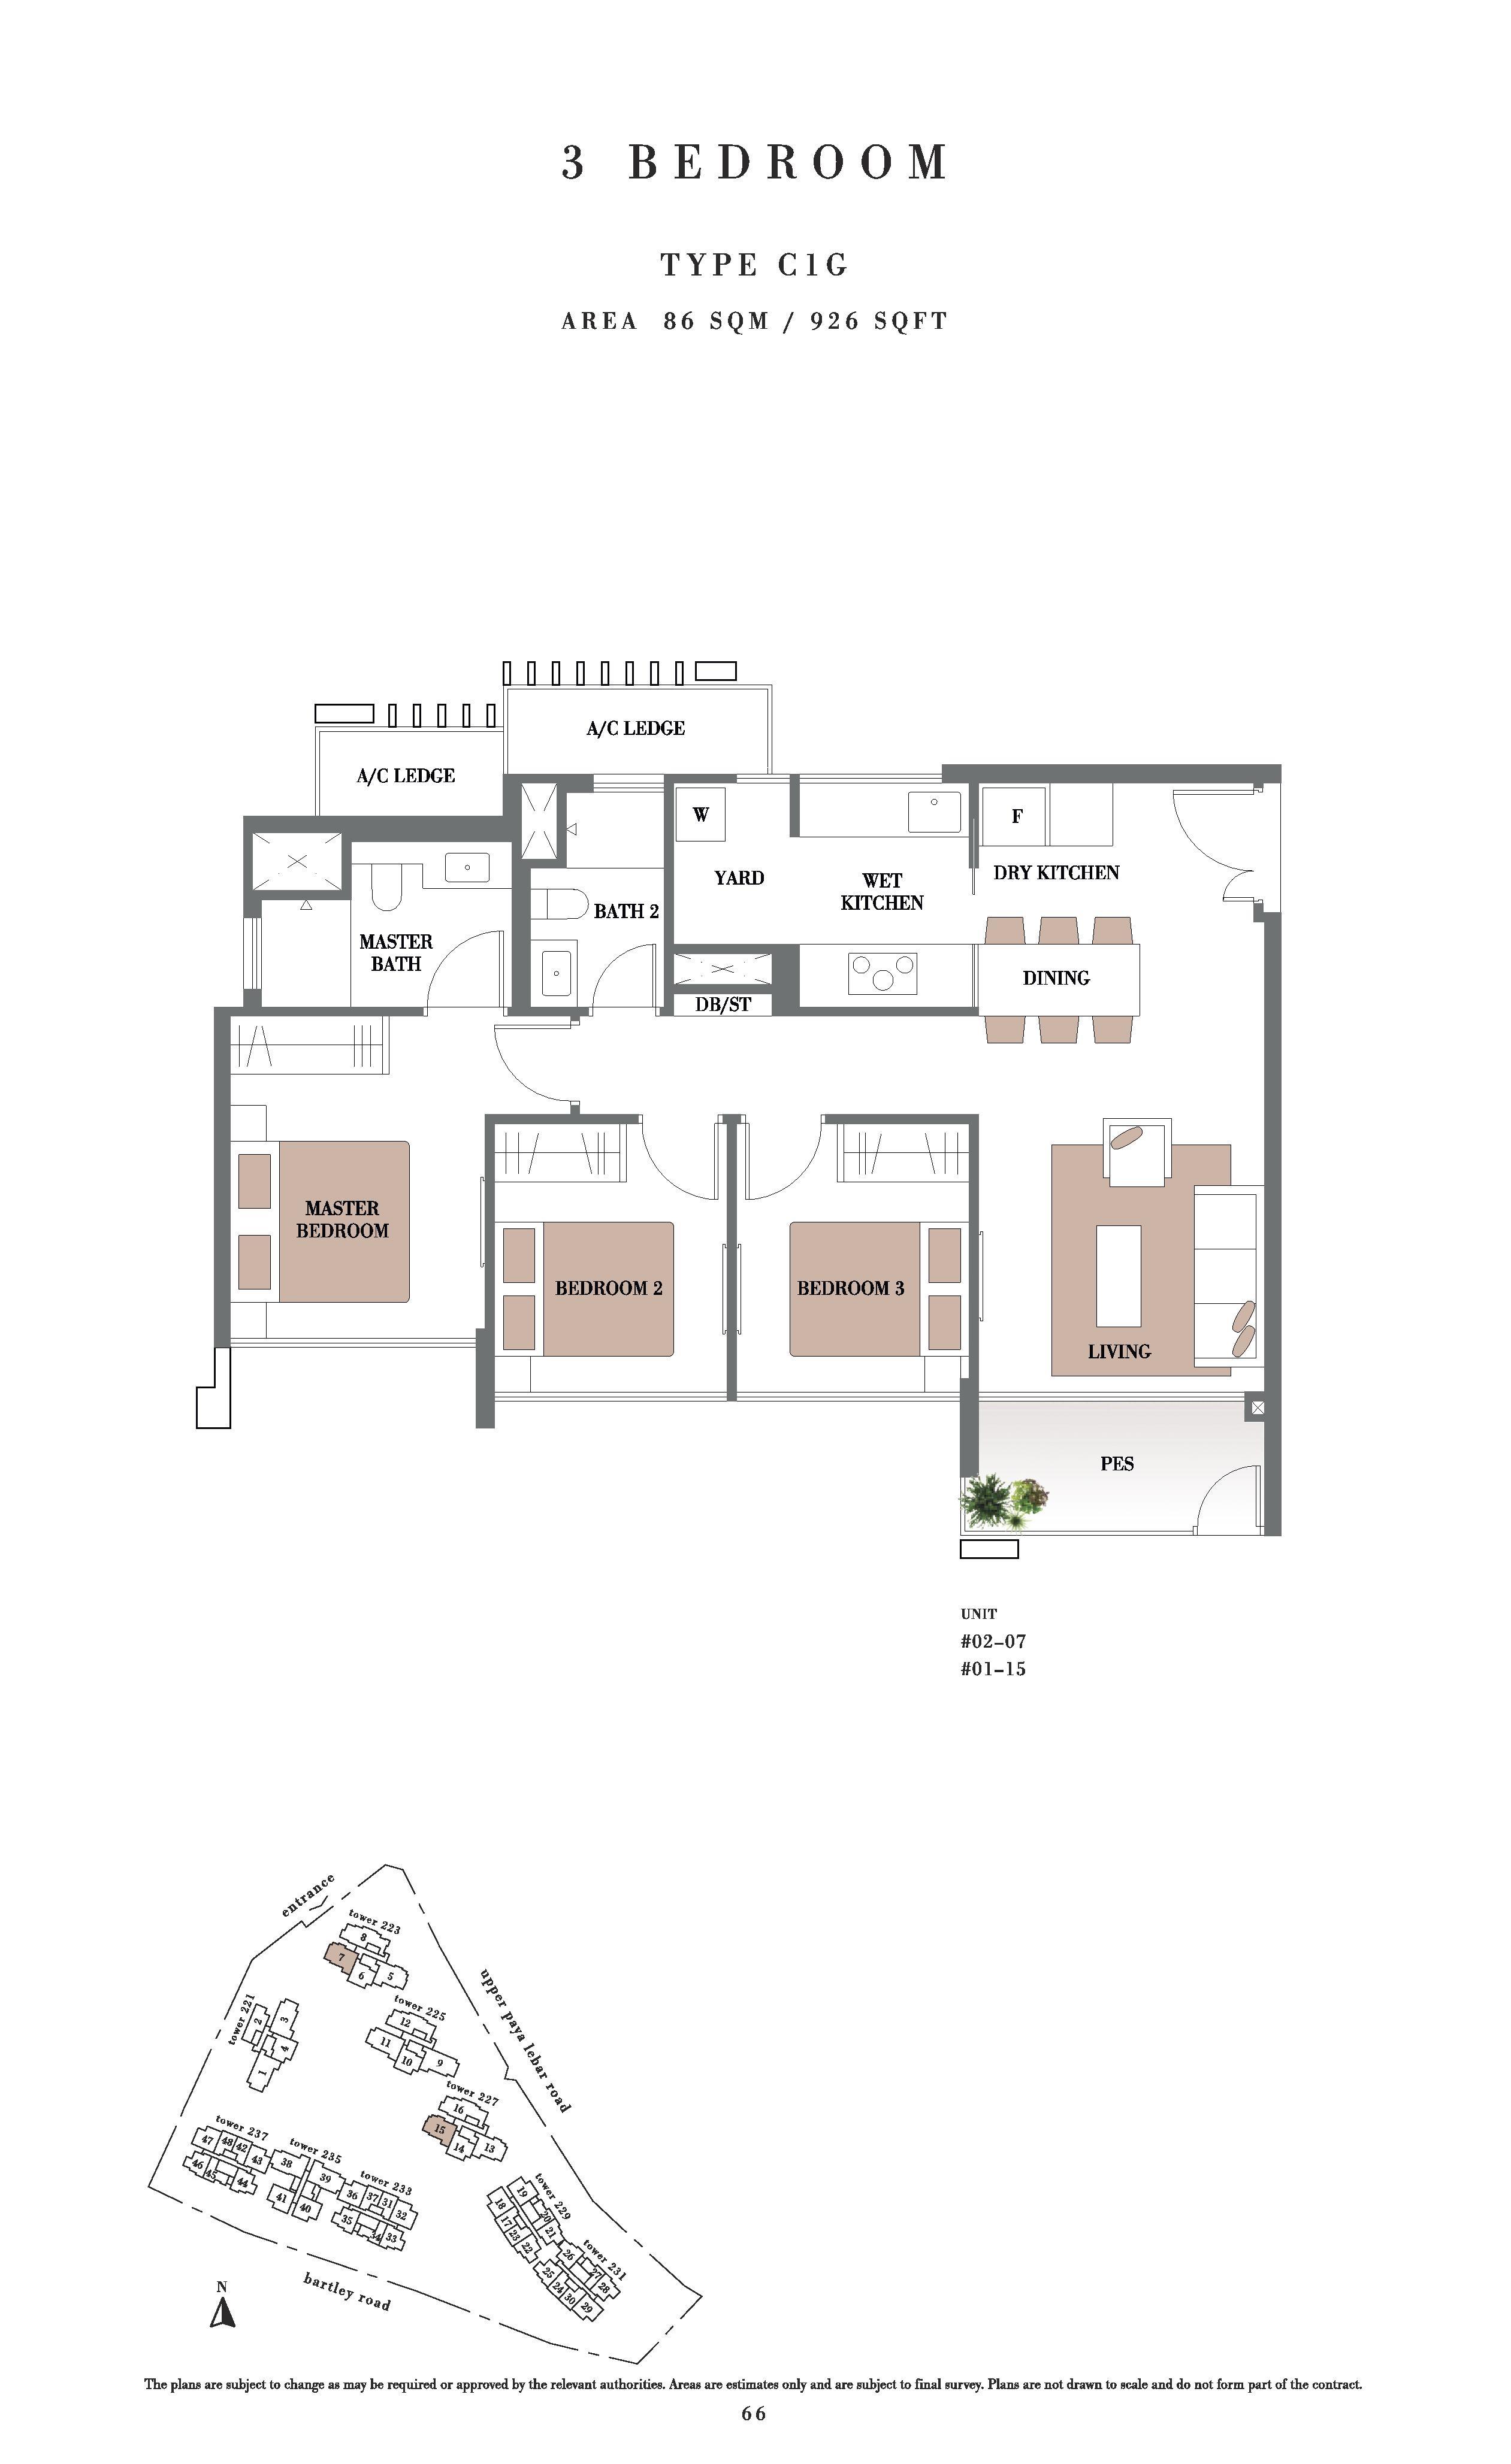 Botanique @ Bartley 3 Bedroom PES Floor Plans Type C1G